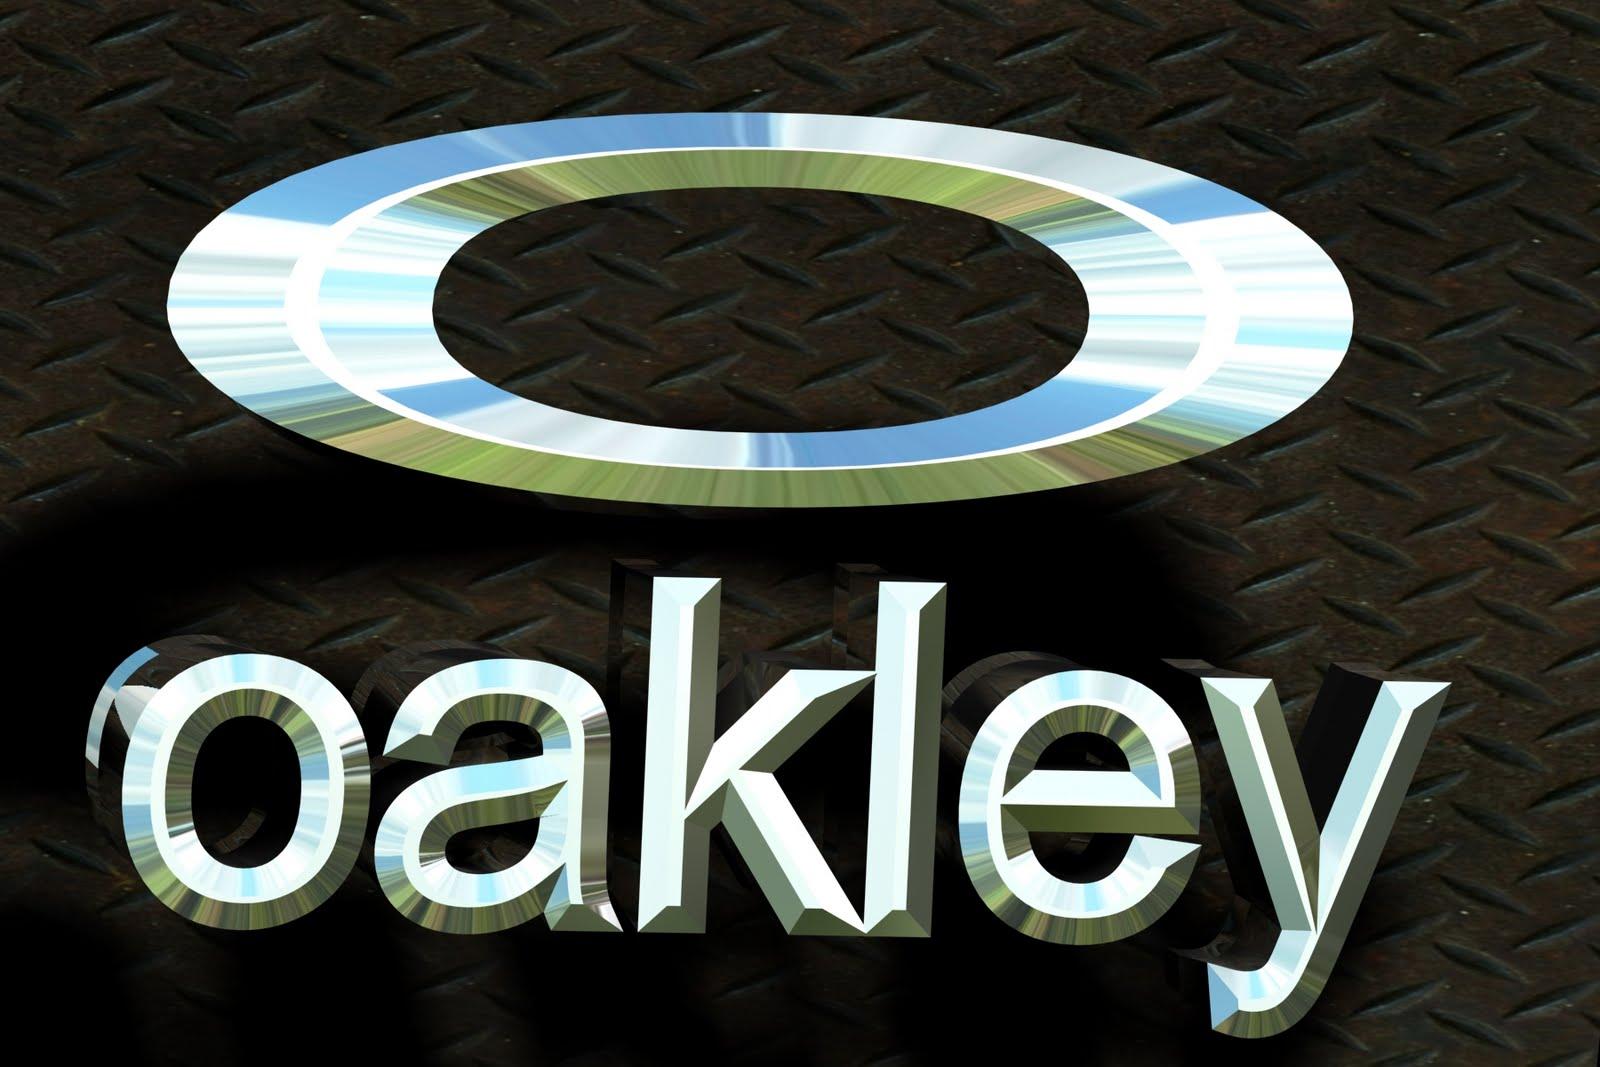 http://2.bp.blogspot.com/_avzzKMKqYNo/TFyVssftwMI/AAAAAAAAAE0/h1yzgI6Eqzs/s1600/oakley%20logo%203d.jpg